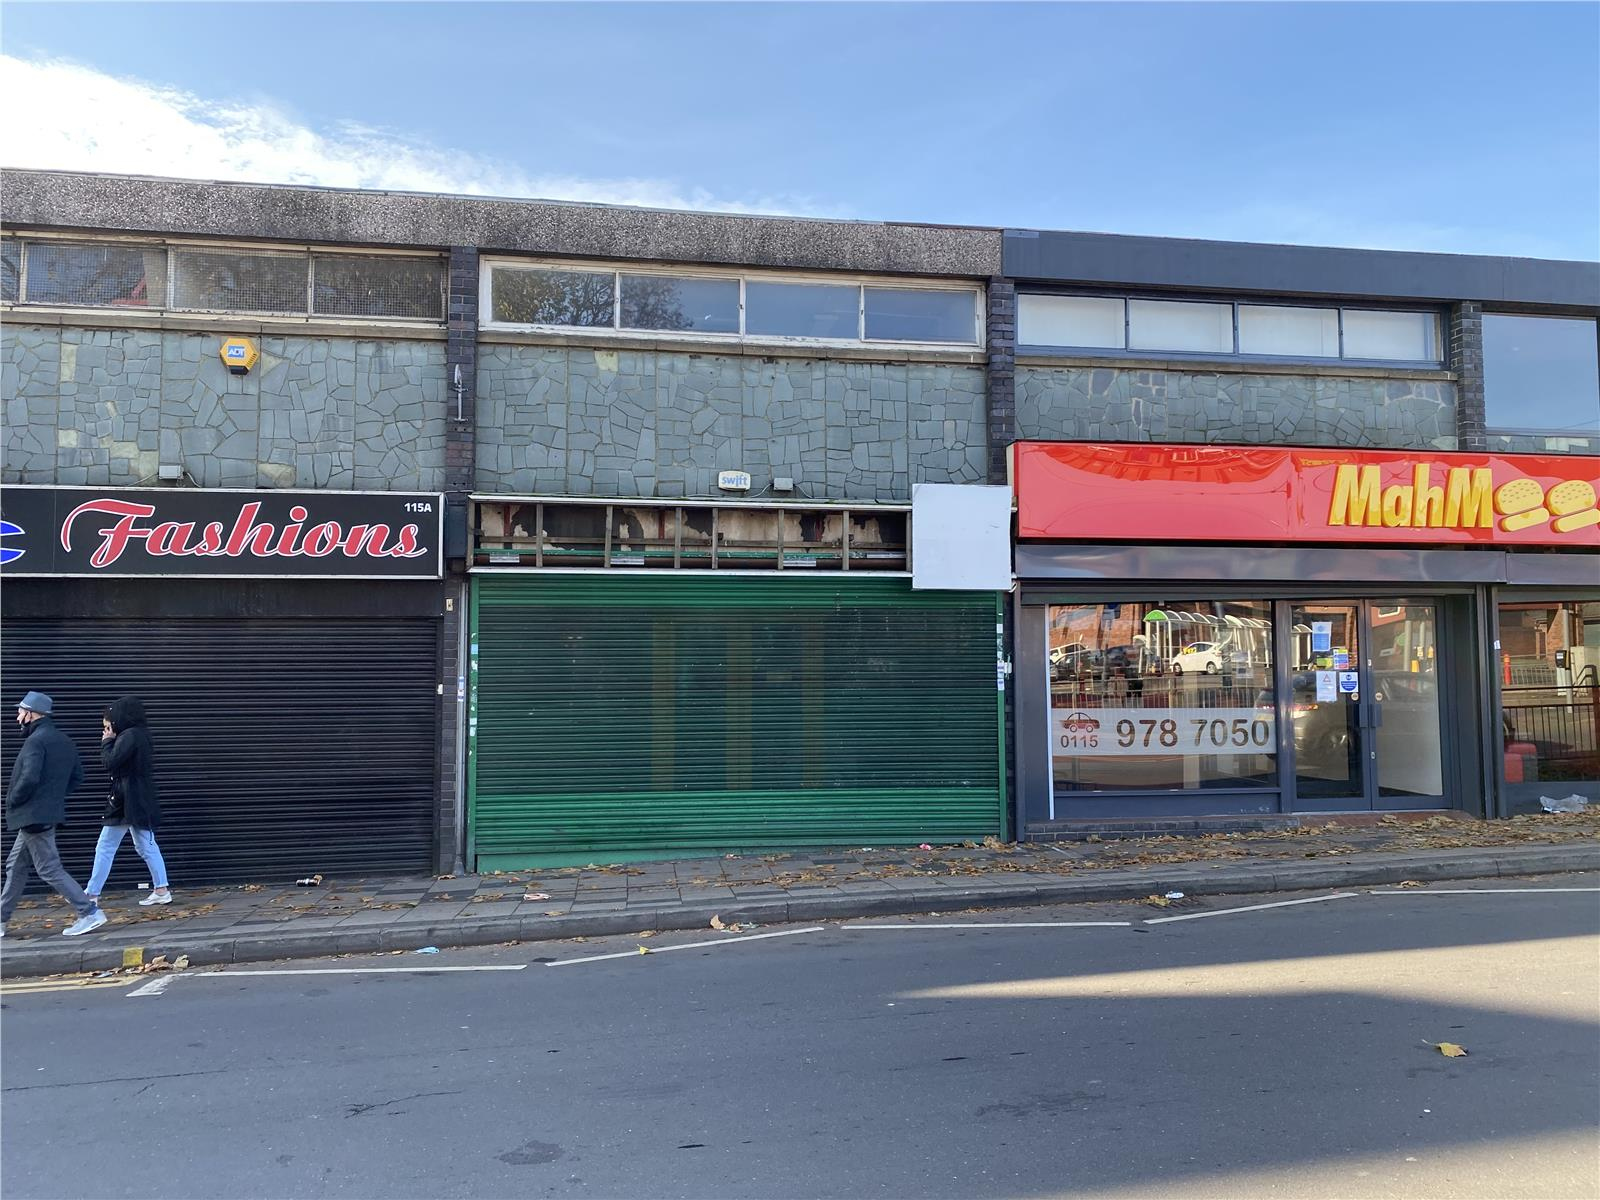 117 Radford Road, Nottingham, East Midlands, NG7